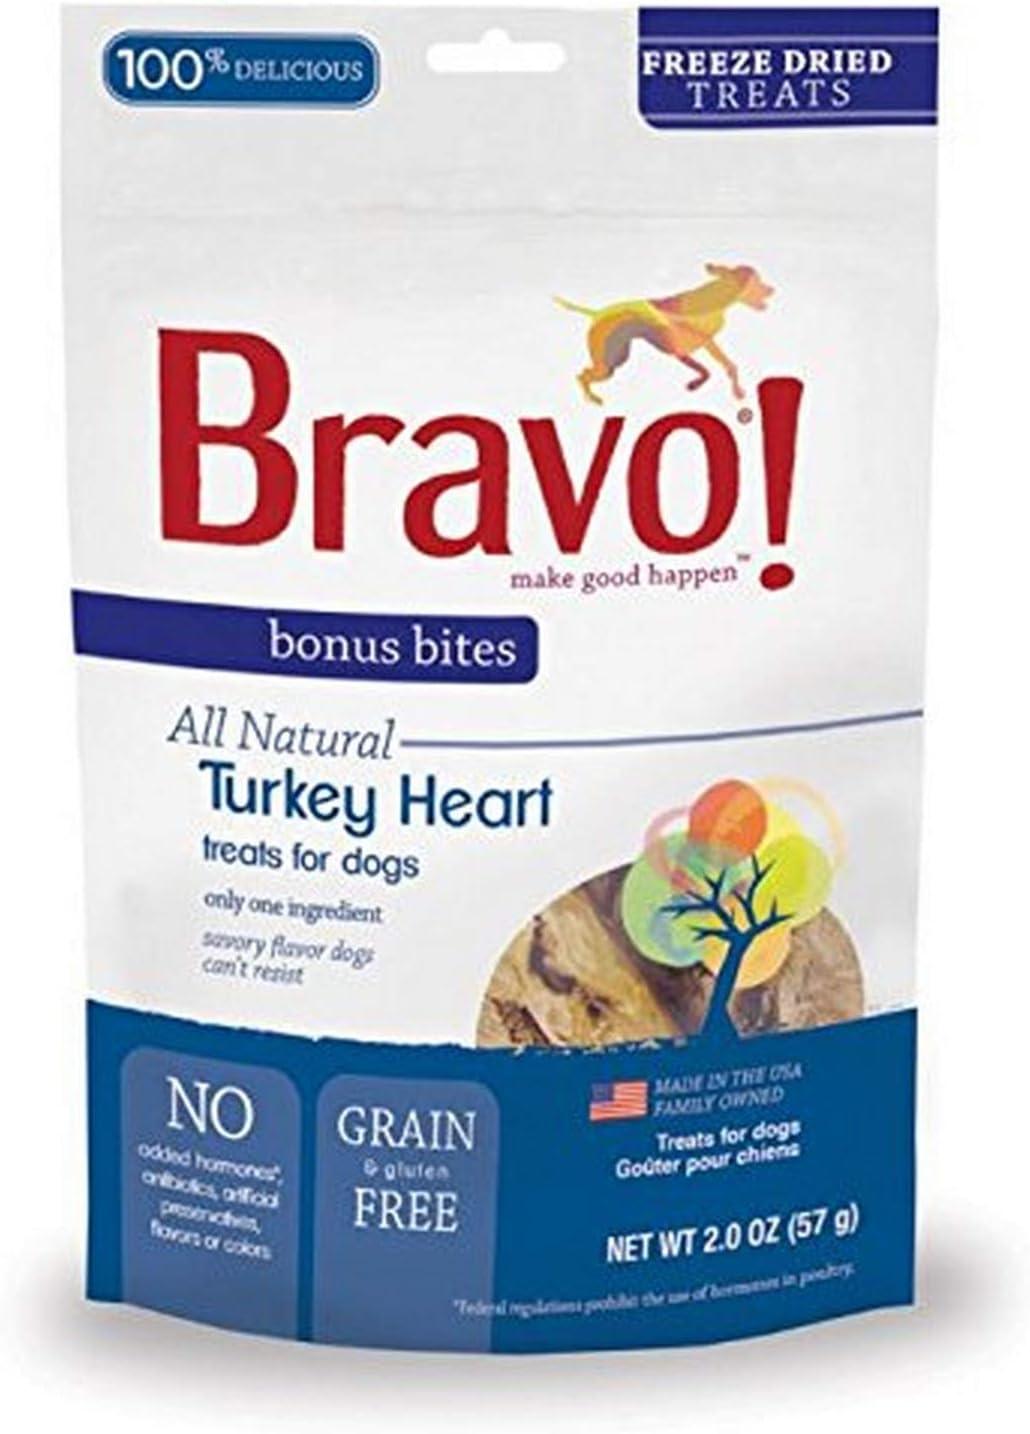 Bravo Bonus Bites Freeze Dried Turkey Heart, 2-Ounce